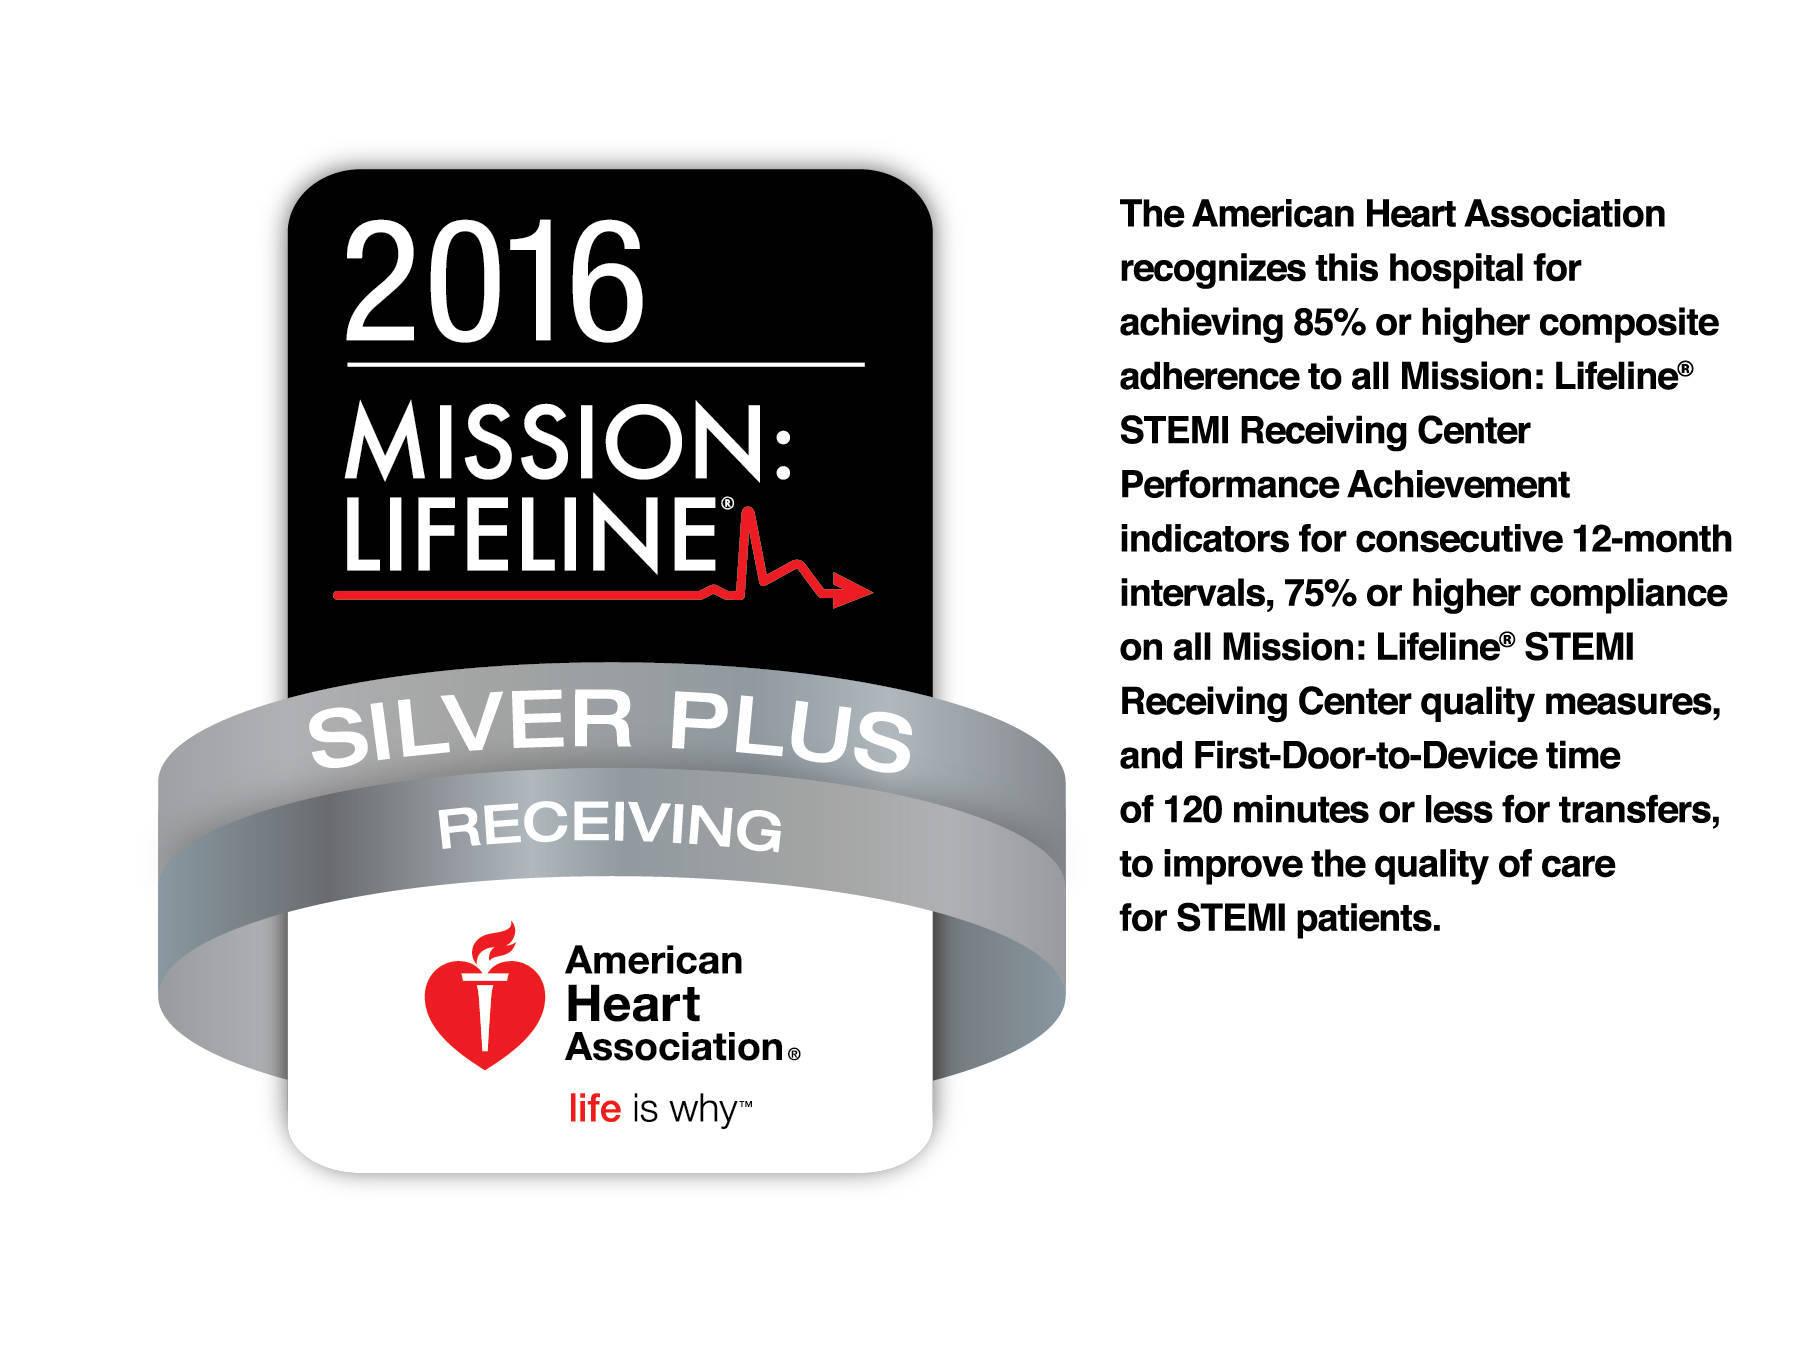 f1195e141a066a54c168_Mission_LifeLine_Silver_Plus_Award.jpg